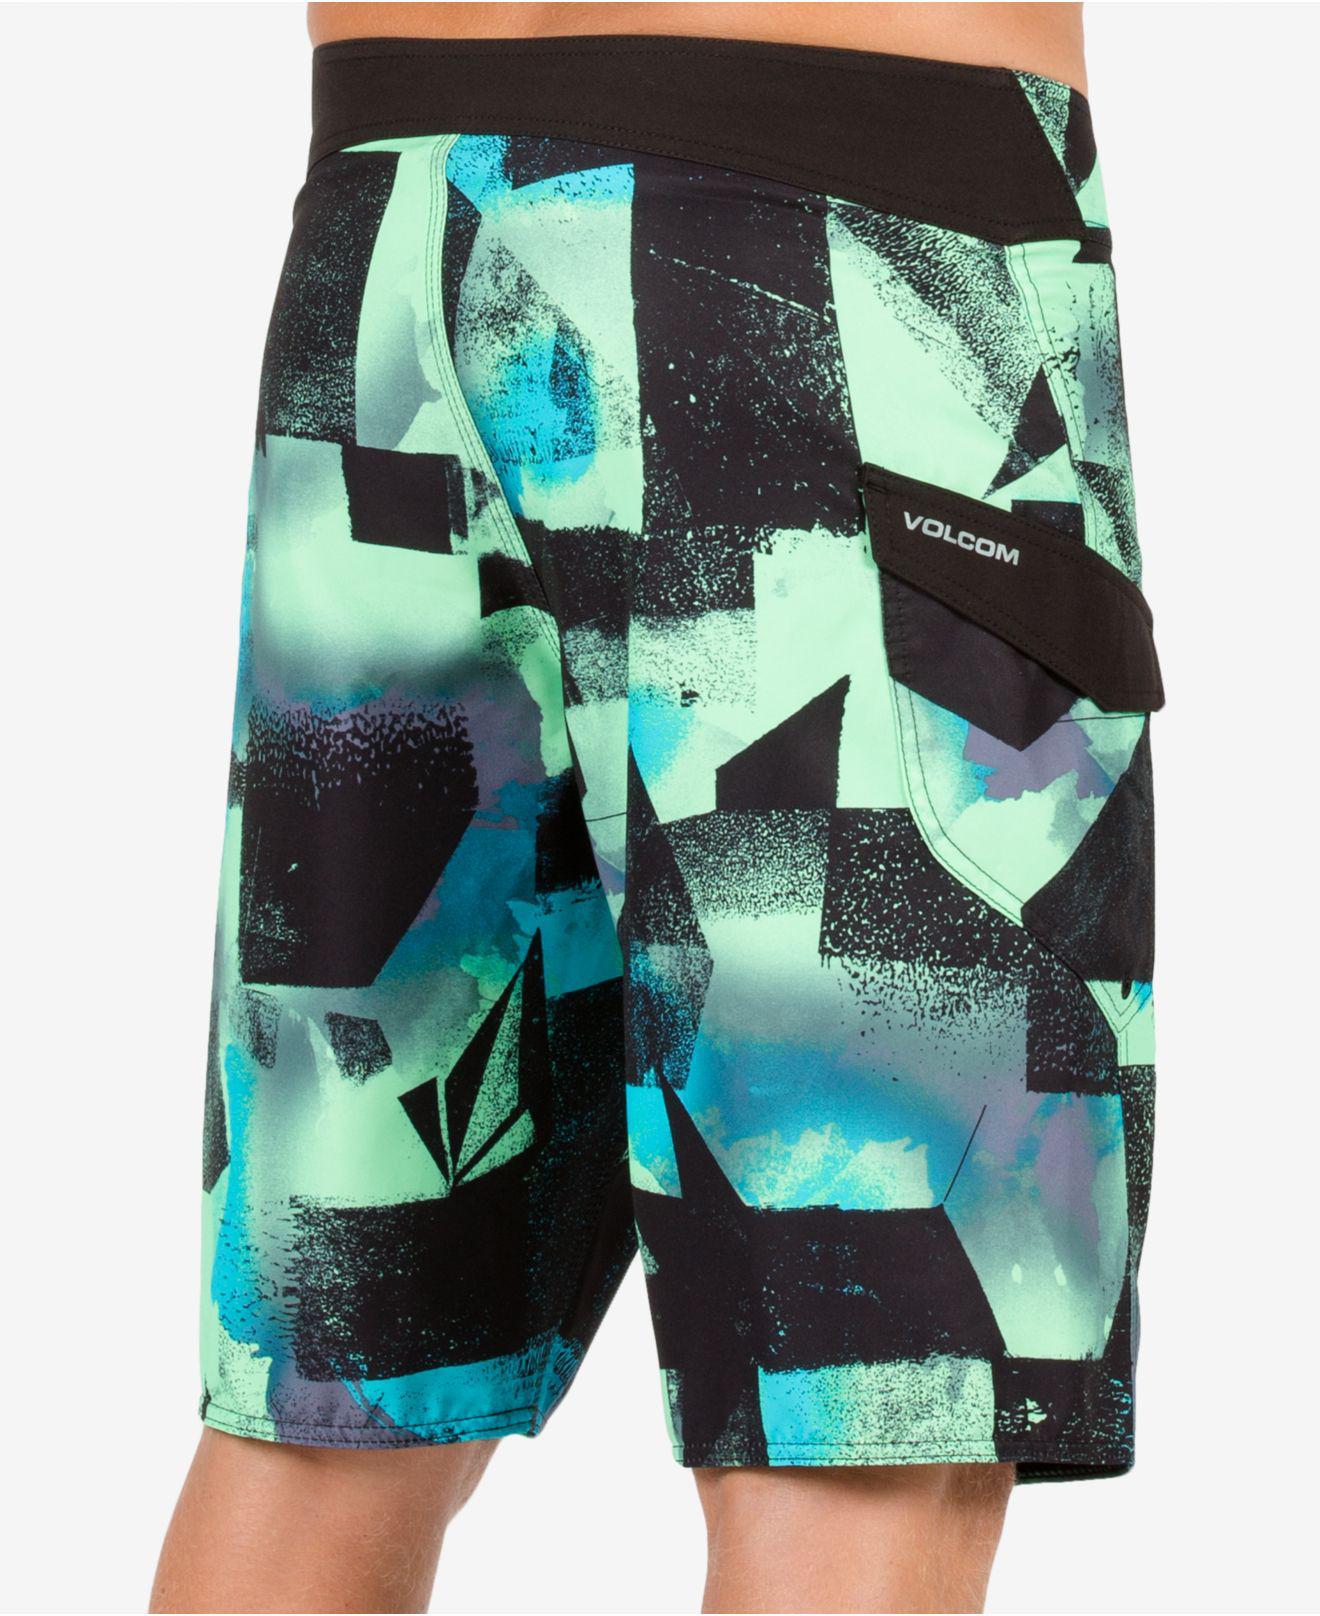 cff902ea34 Lyst - Volcom Men's Costa Paste Up Abstract-print Swim Trunks in ...